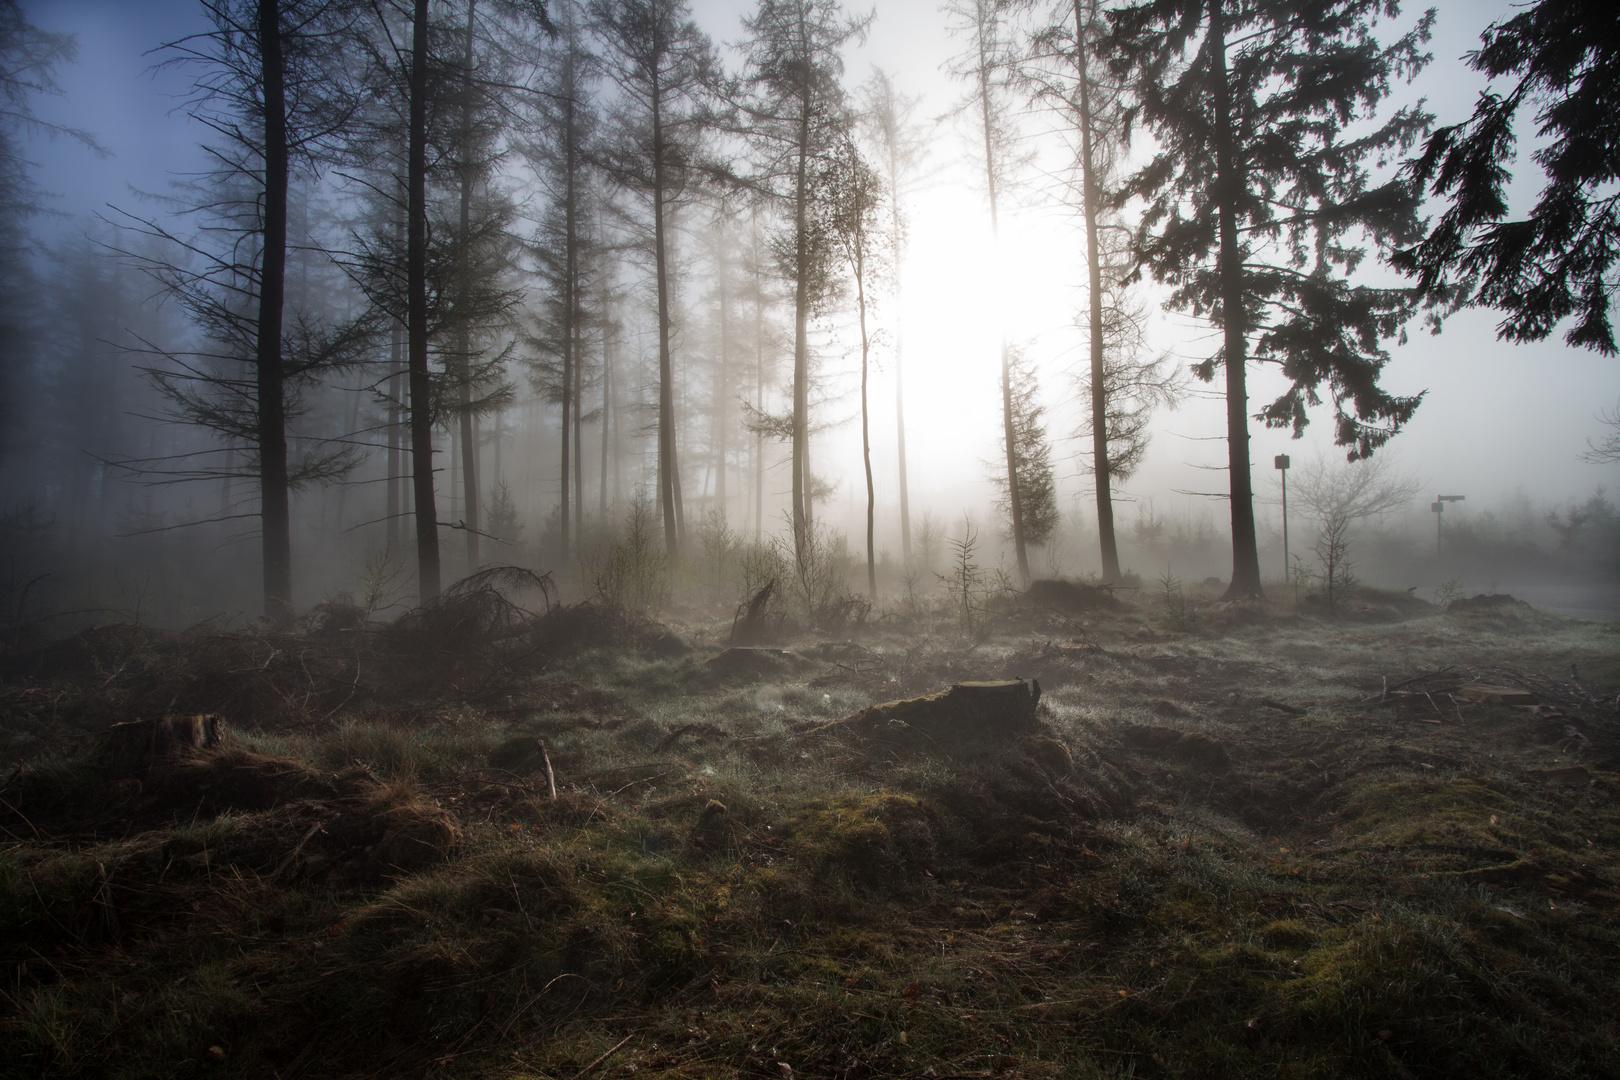 Nettenscheider Wald 2